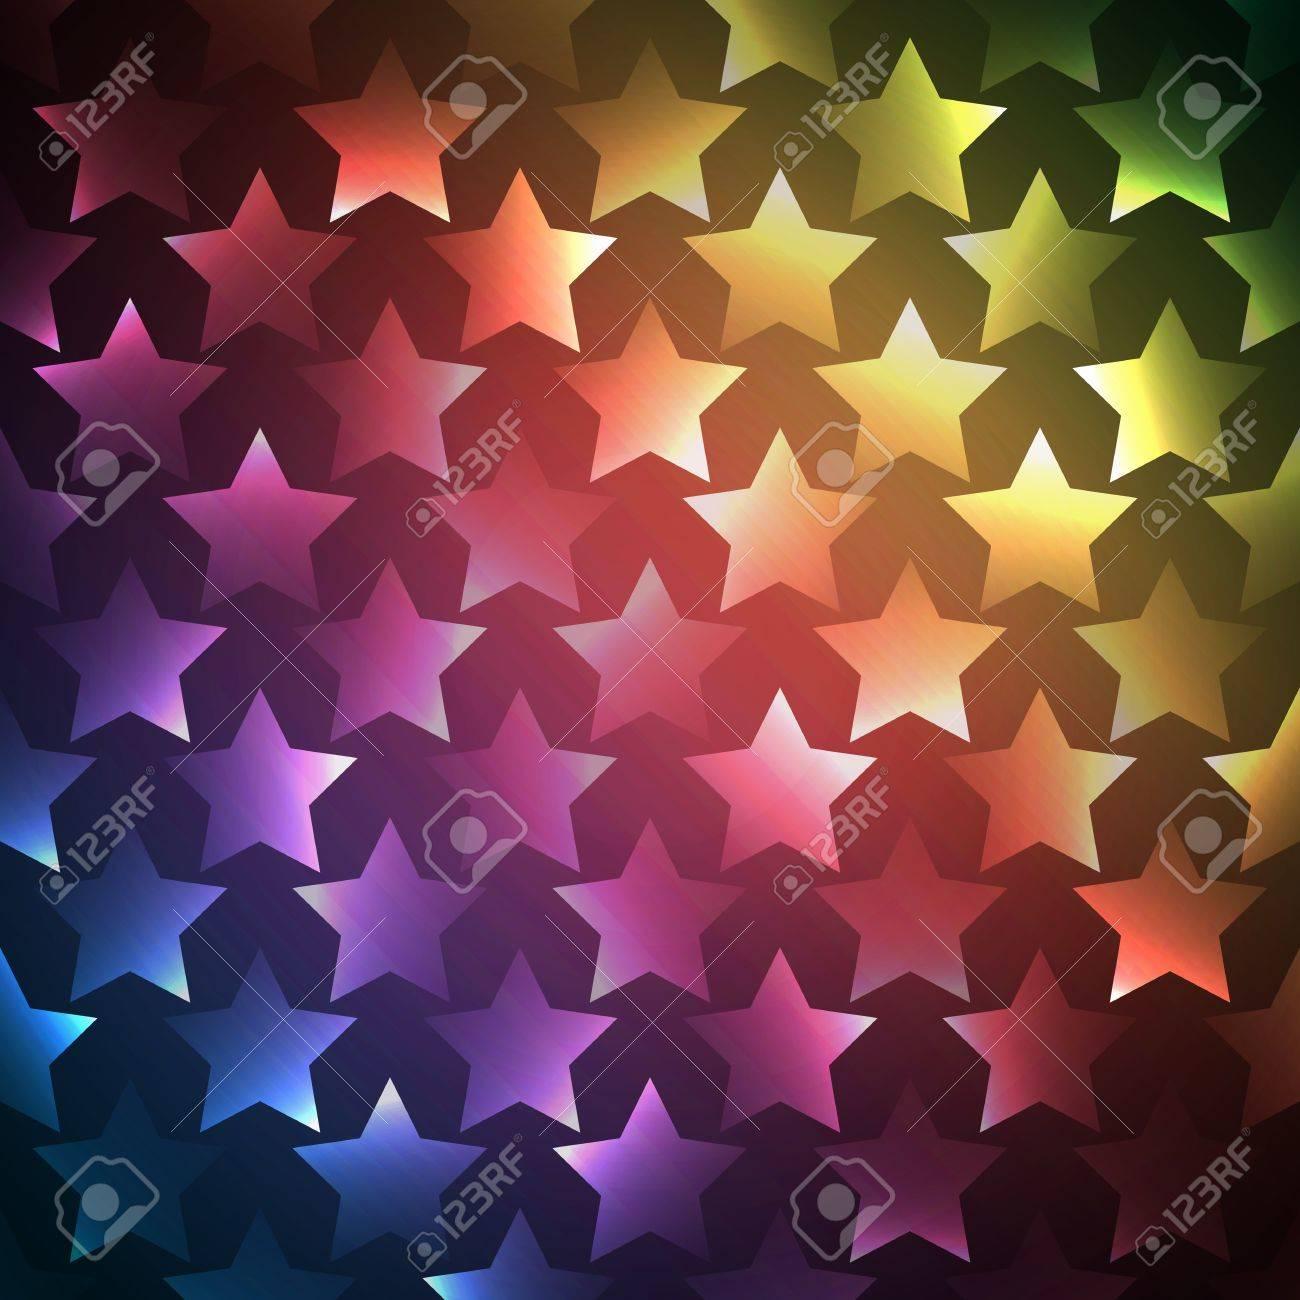 47421278 abstract bright spectrum wallpaper illustration for modern disco design cool pattern background rain